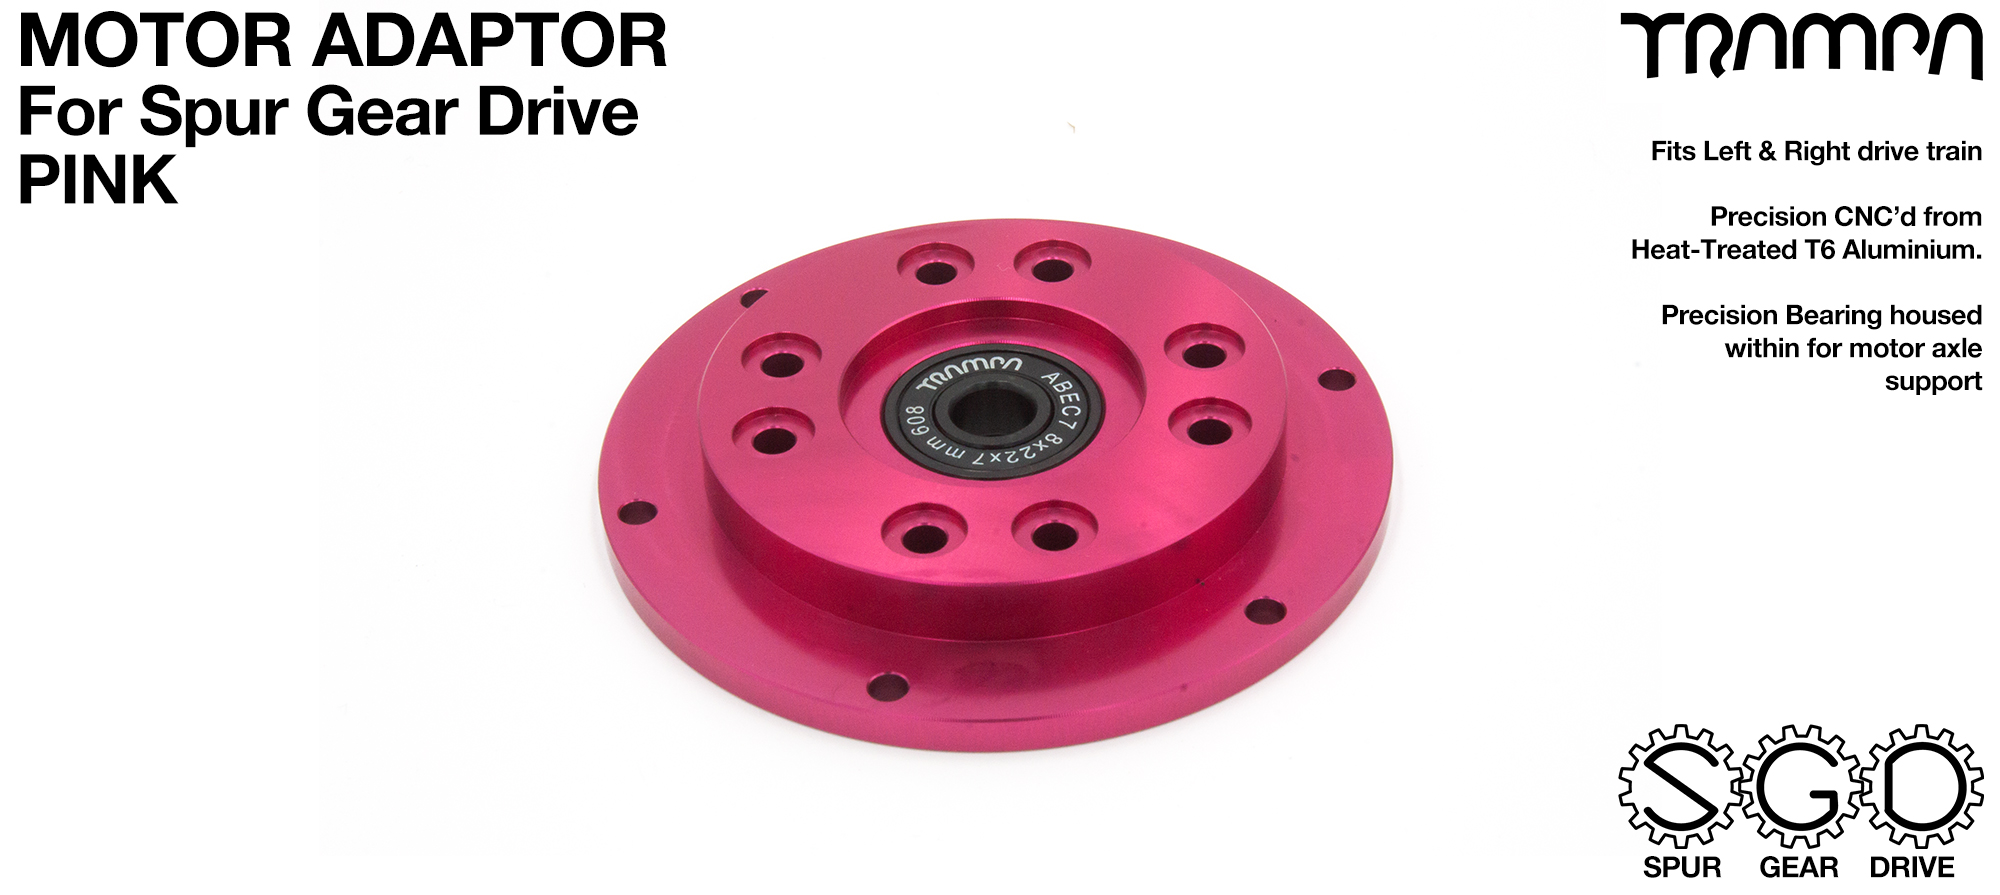 SPUR Gear Drive Motor Adaptor PINK